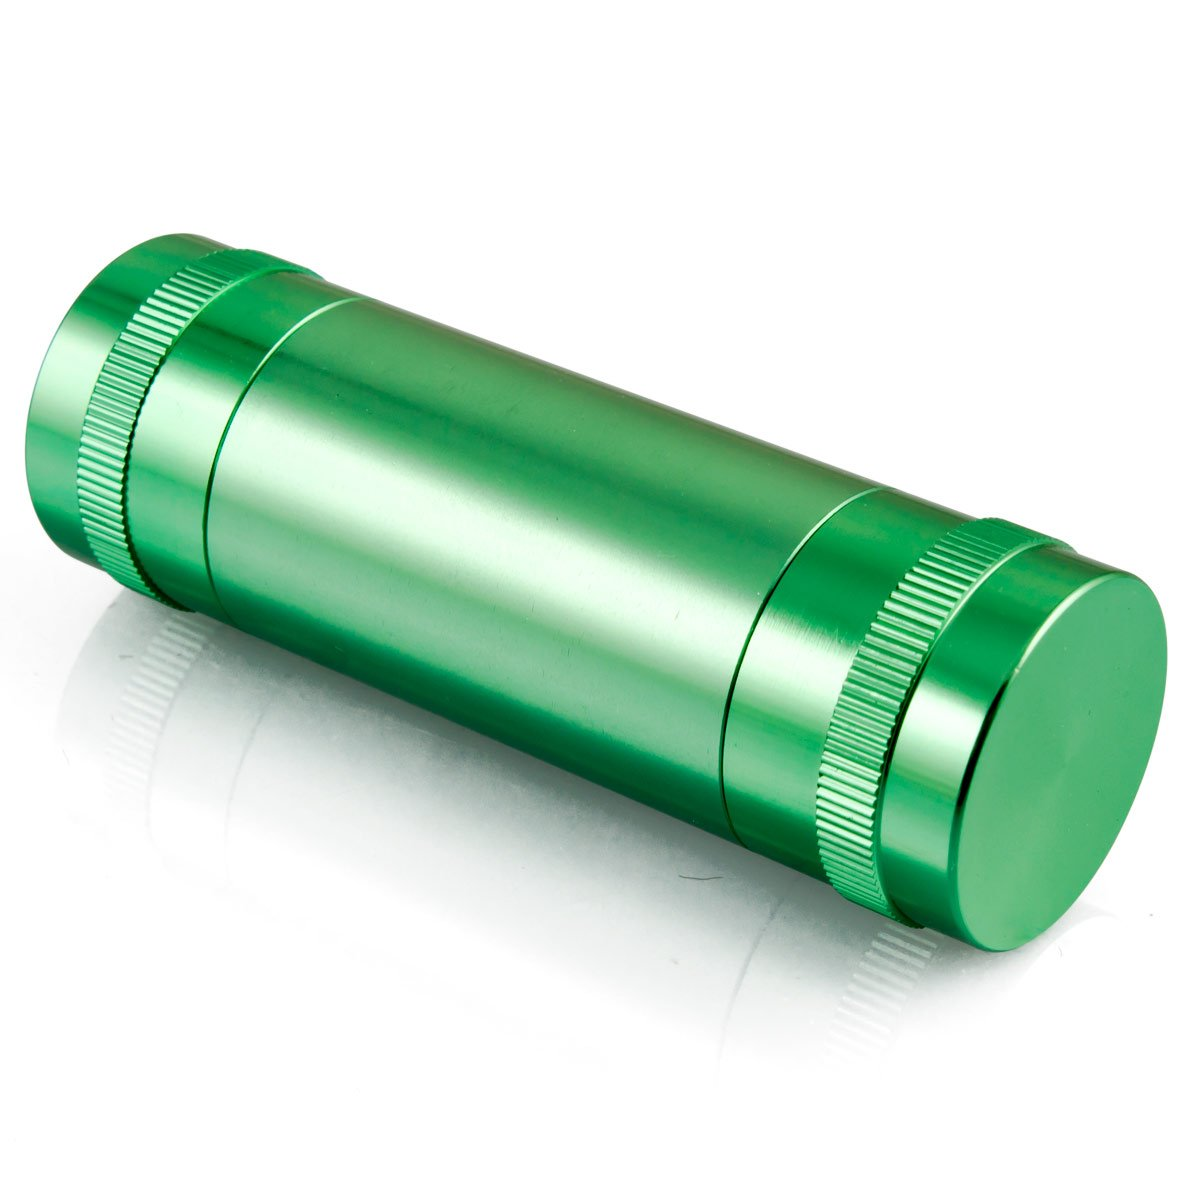 FORMAX420 Green Aluminum Pollen Press 2.5 inch